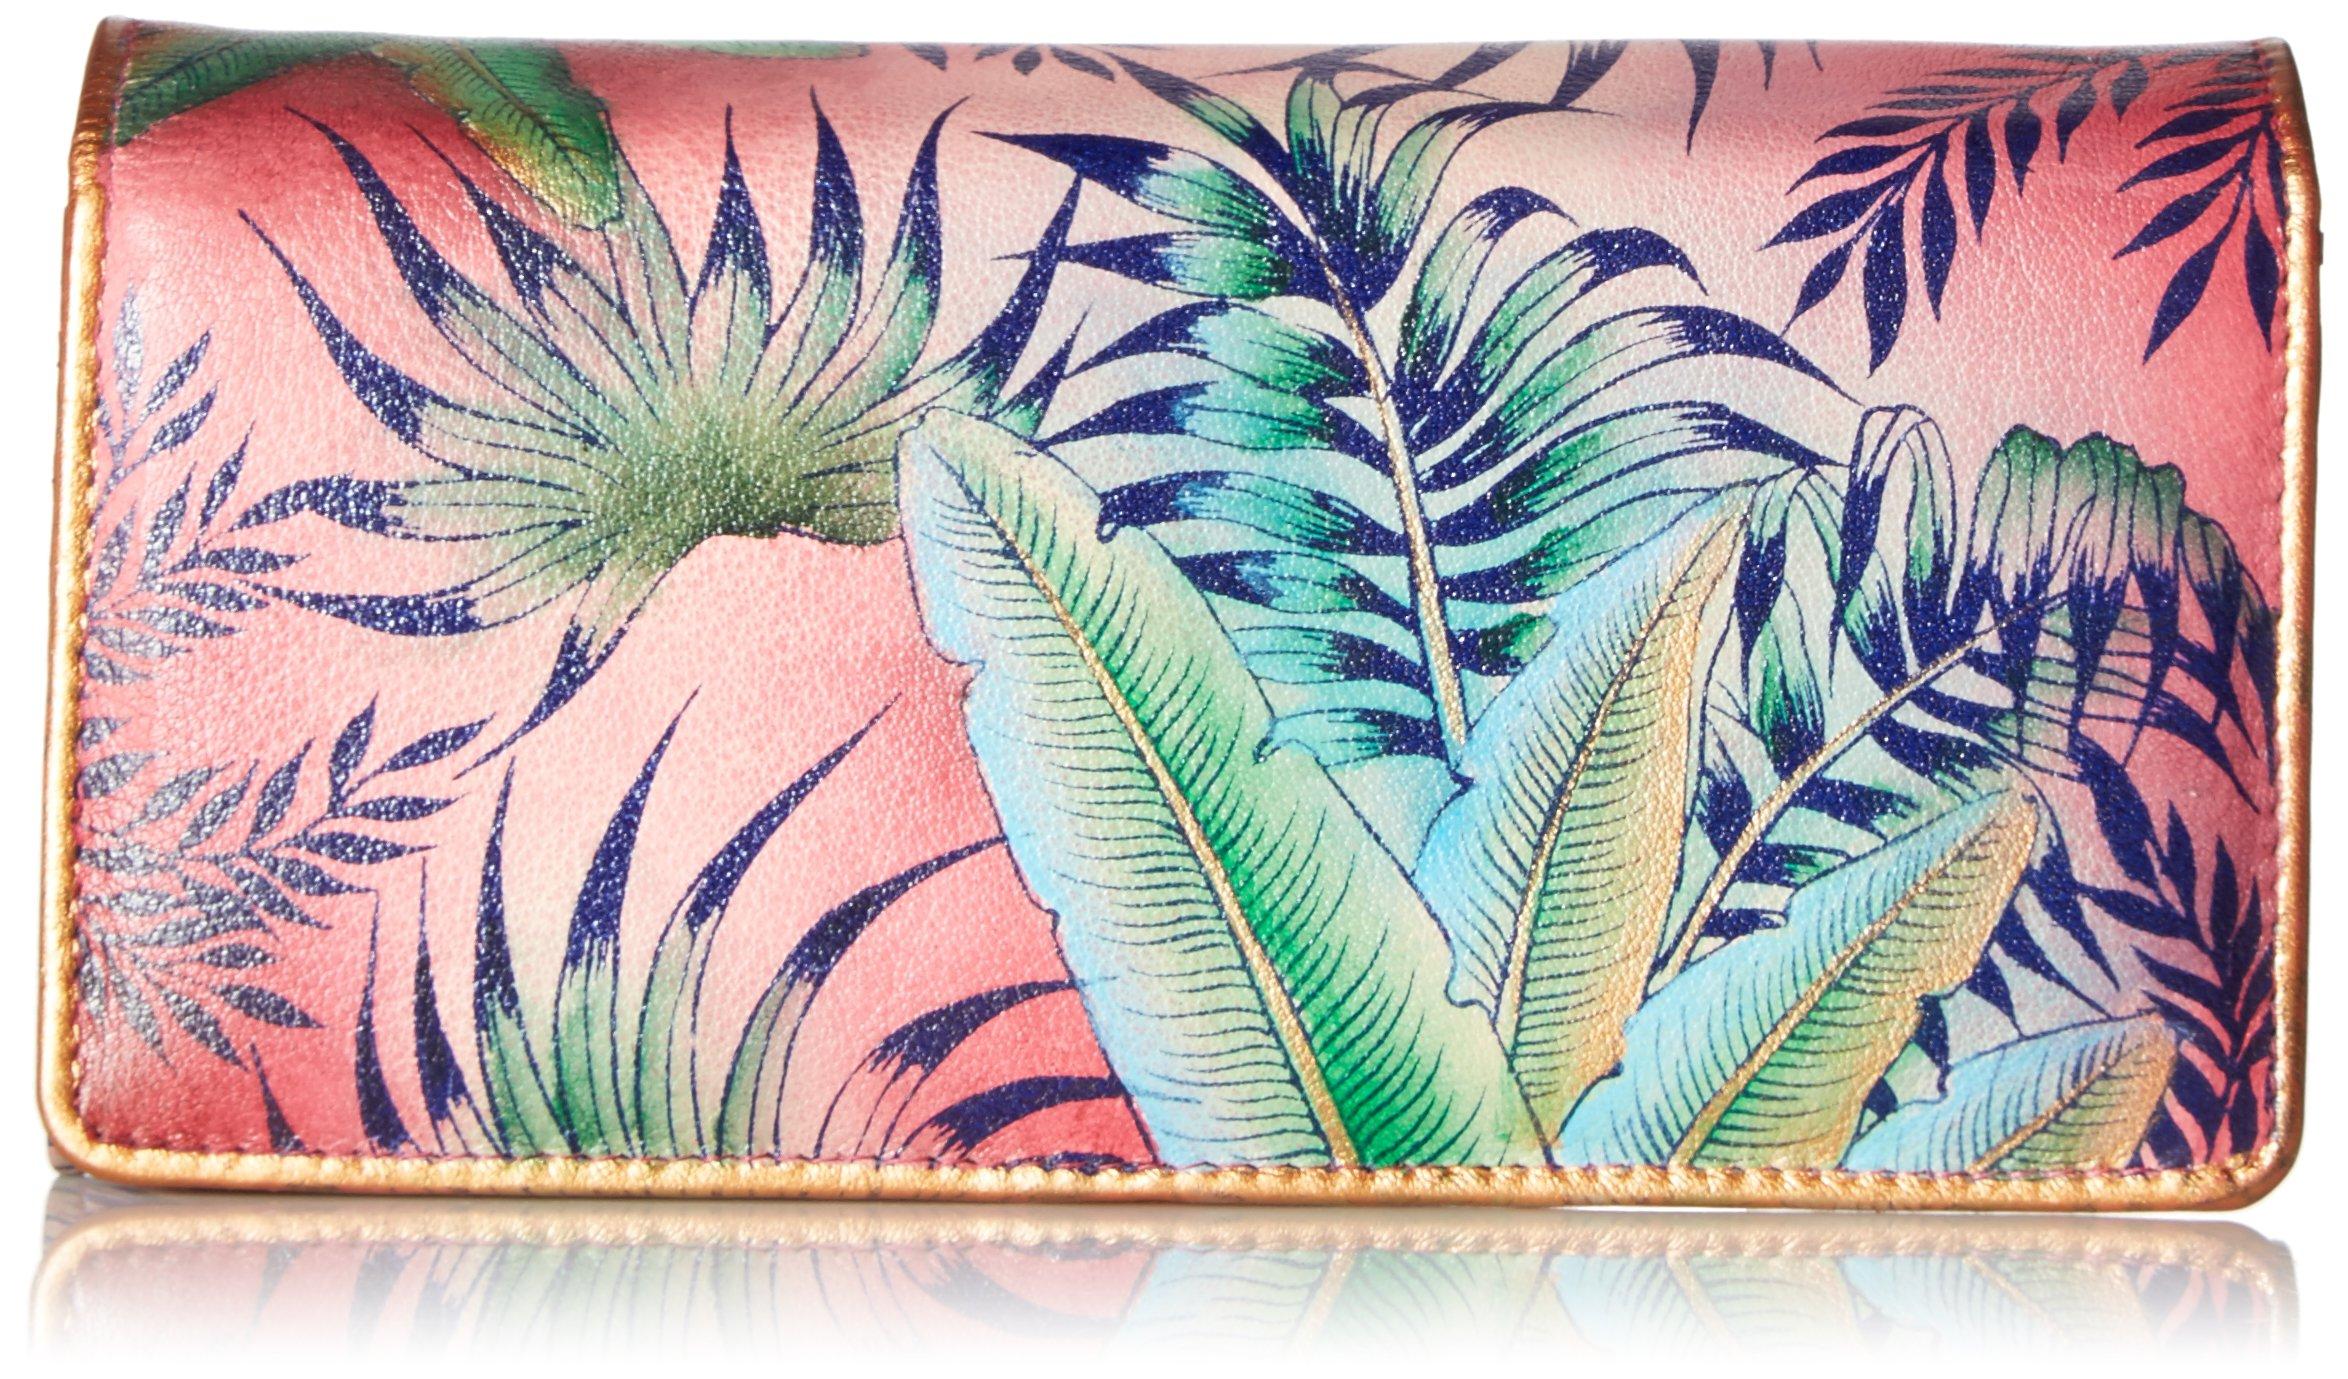 Anuschka Hand Painted Rfid Blocking Accordion Flap Wallet Tropical ISLAND Wallet, Tri-Tropical Island, One Size